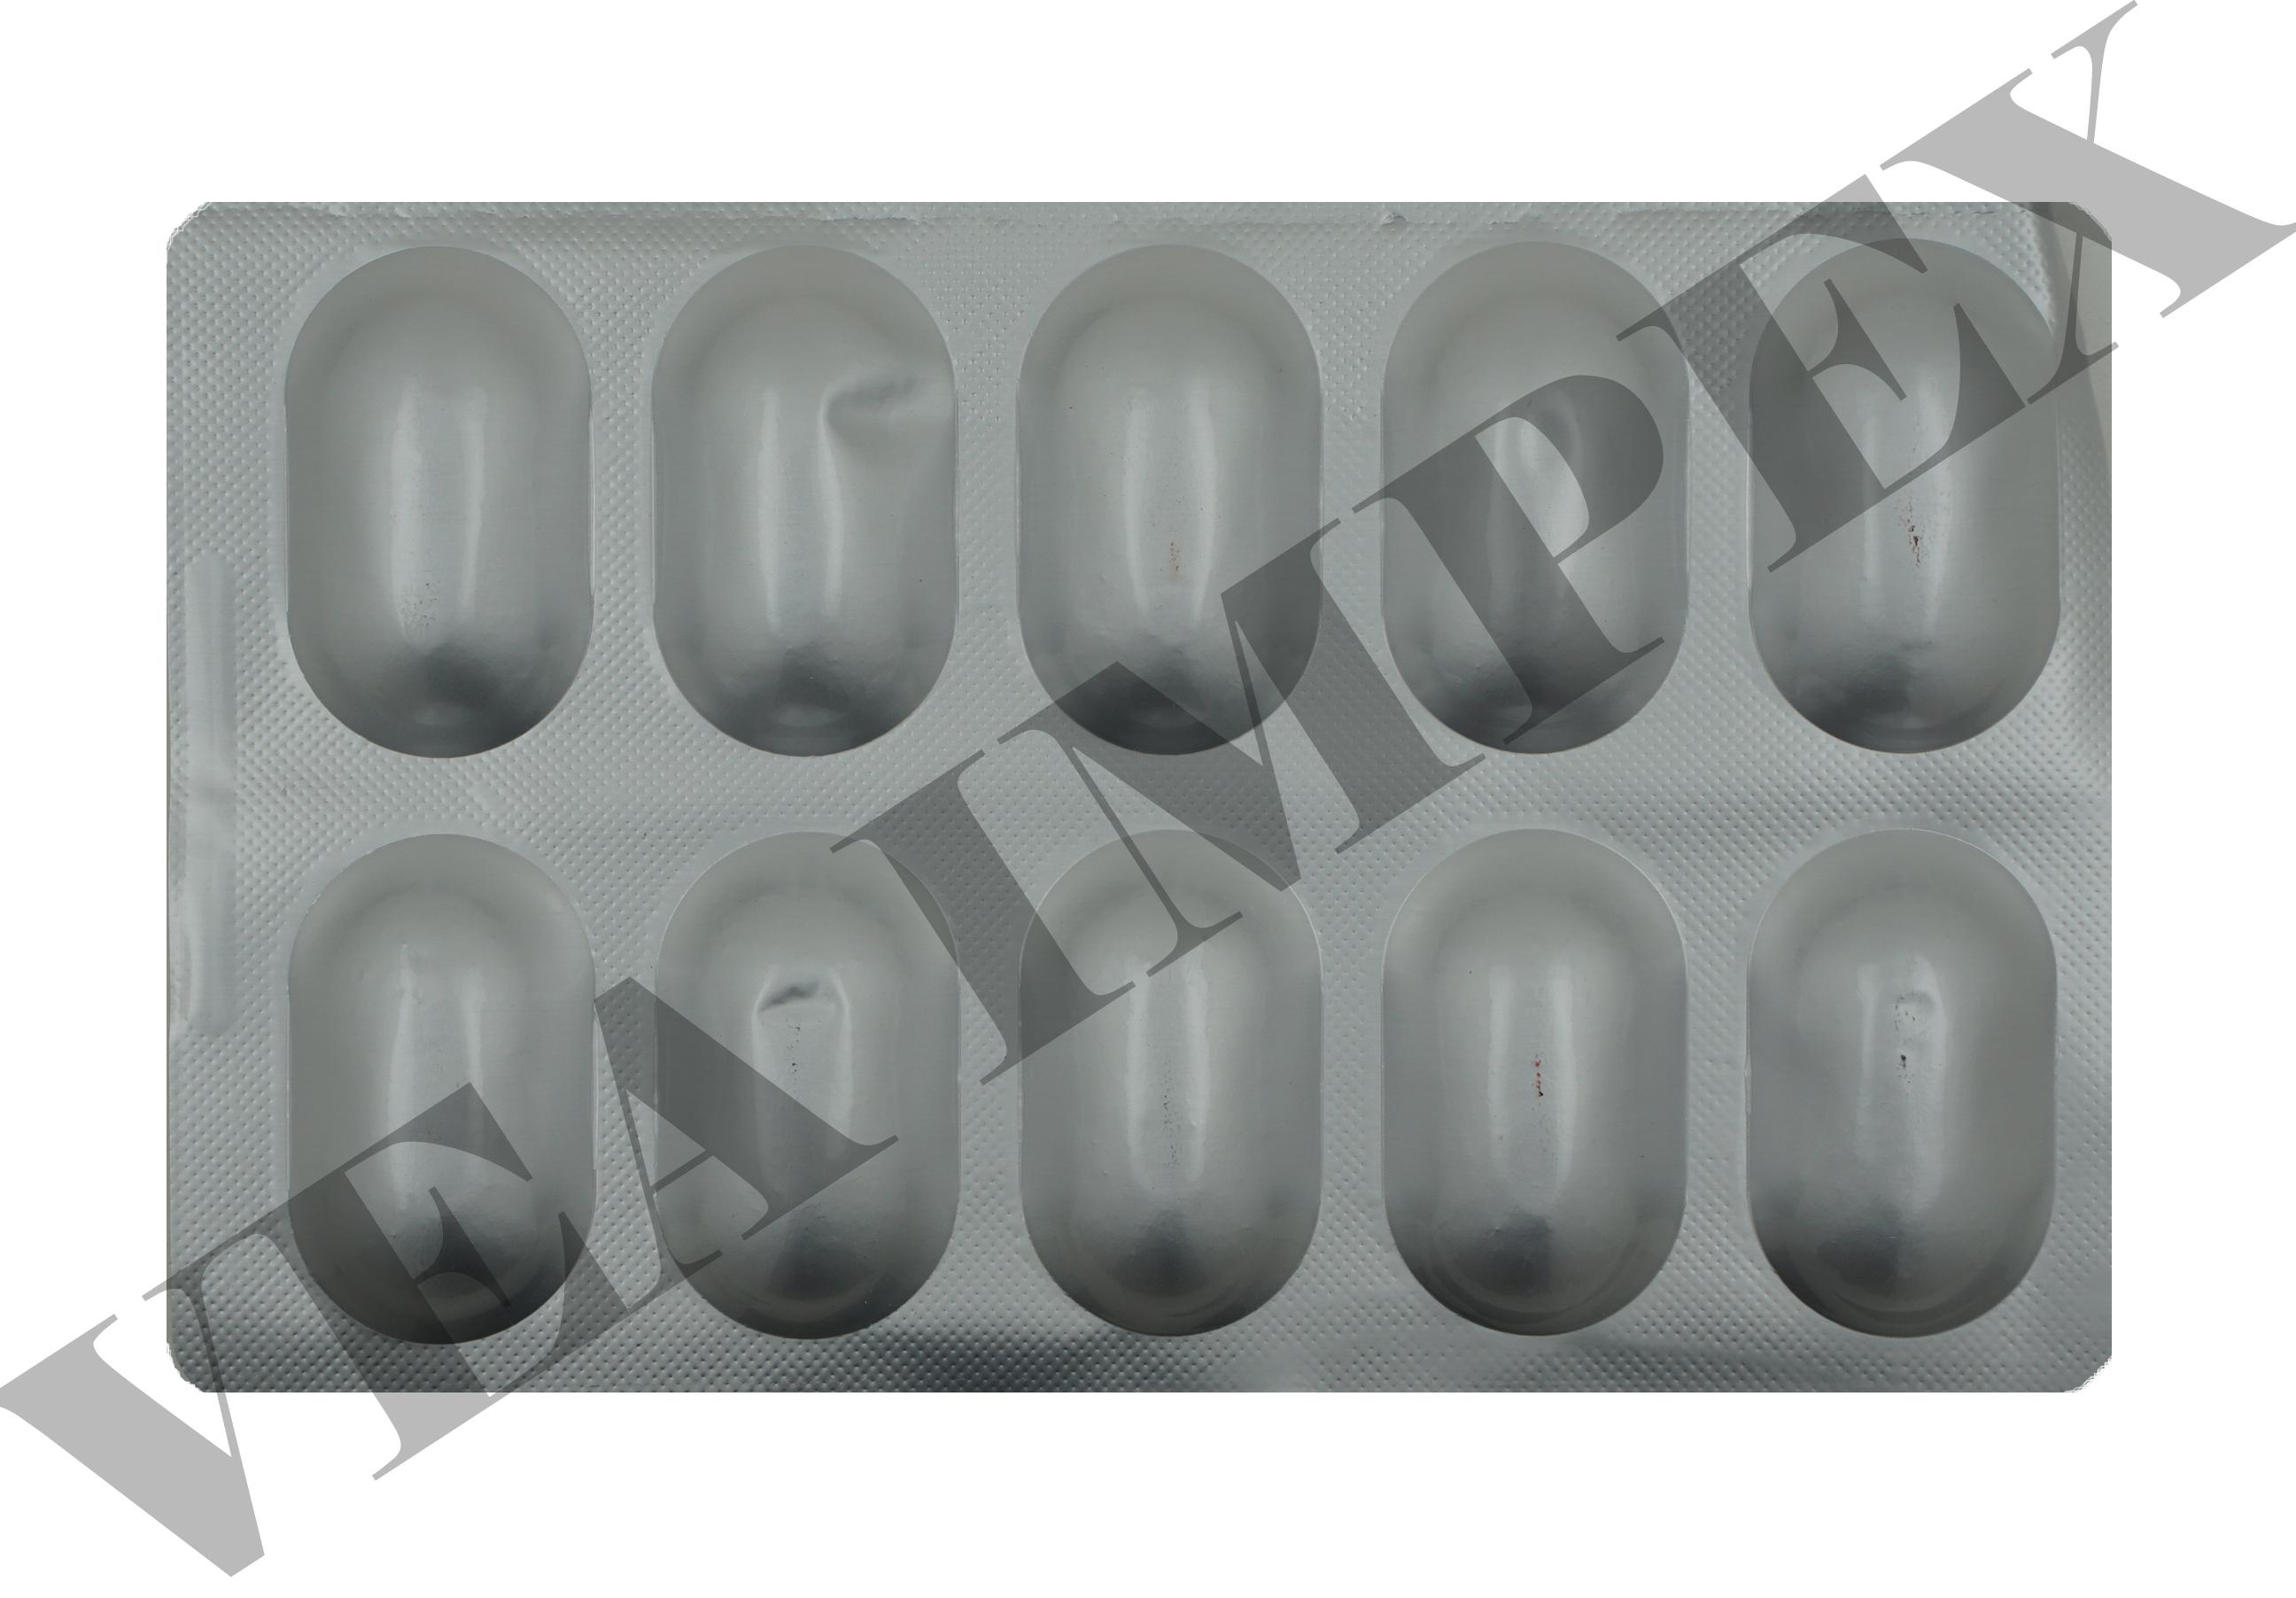 Cefolac OZ Tablets